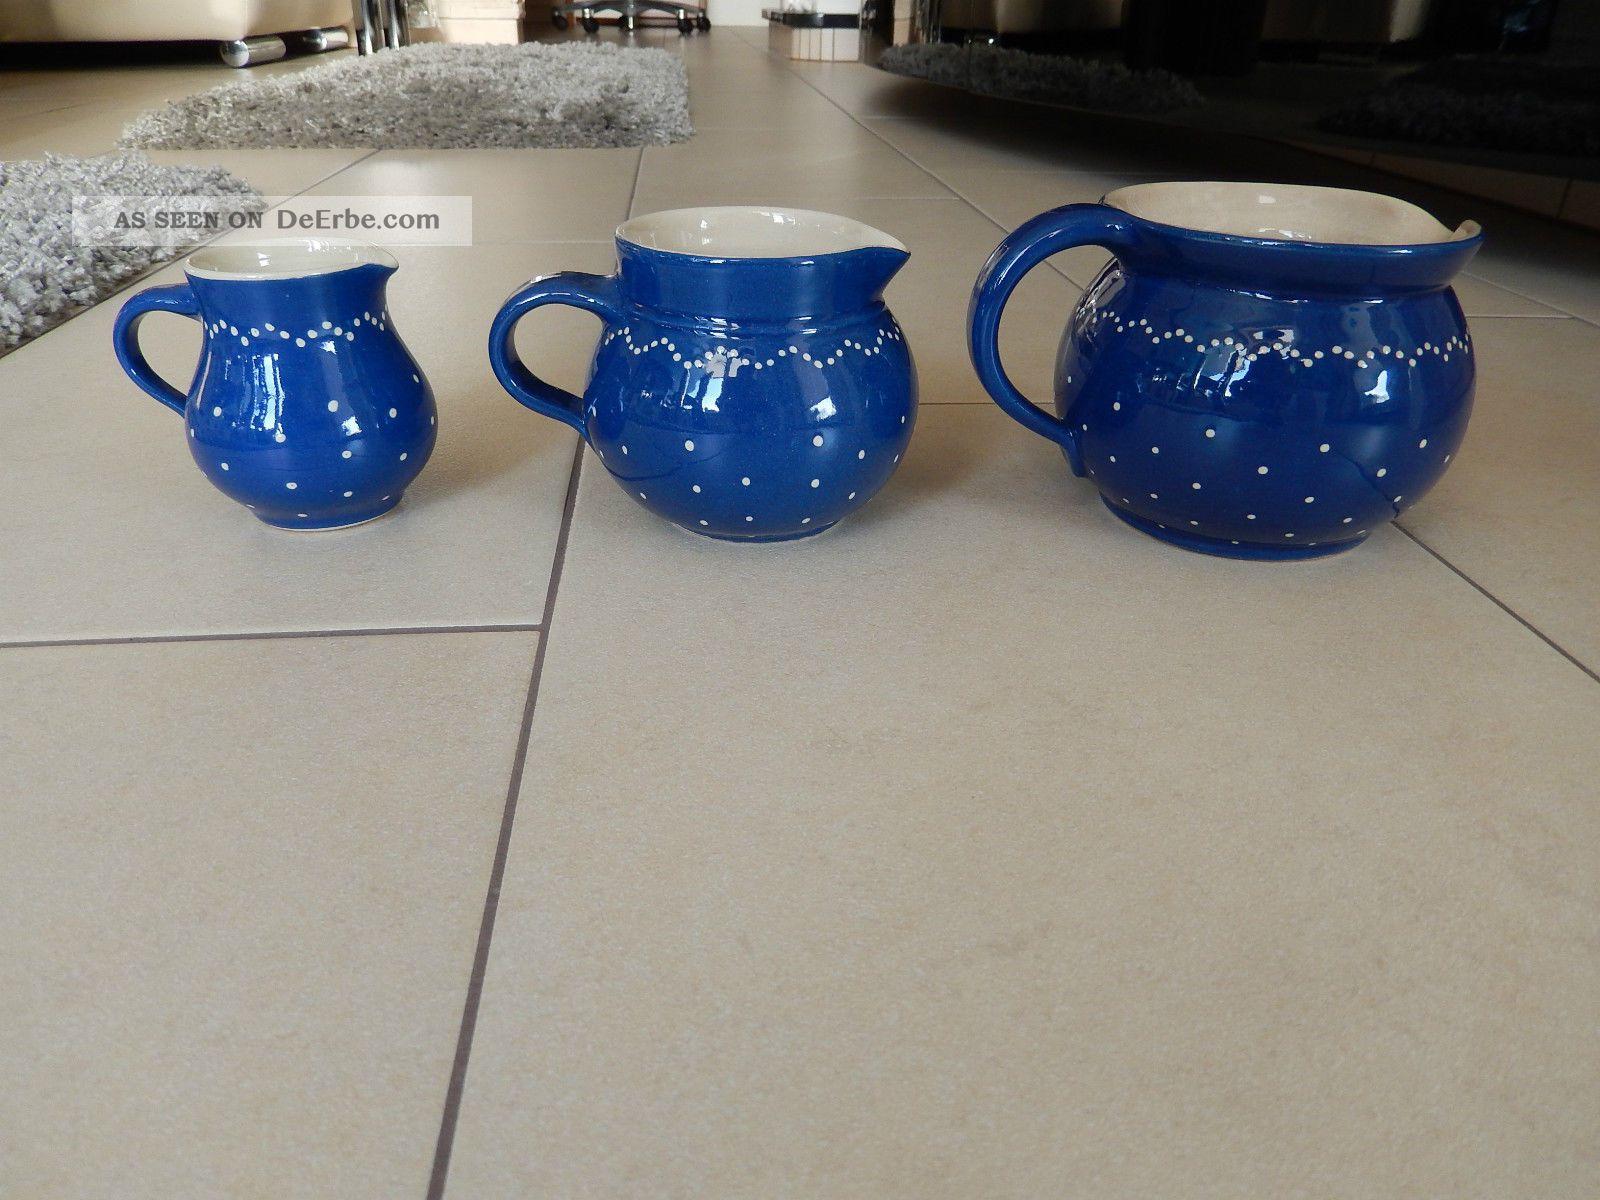 Keramik Marke Bestimmen. Category Porcelain Marks